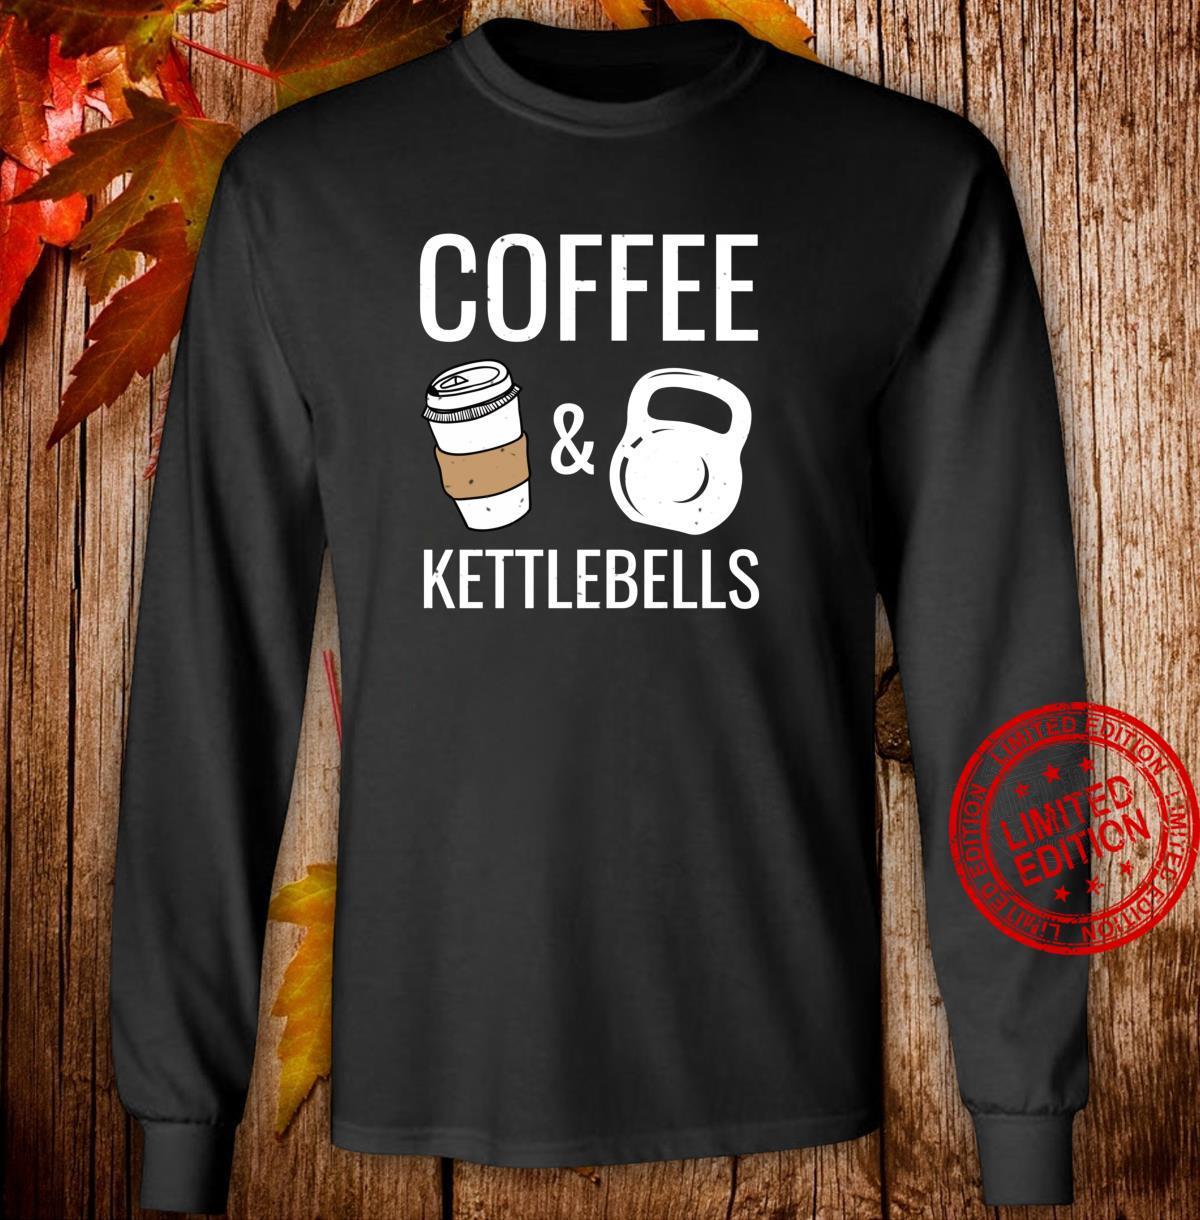 Kettlebells & Coffee HIIT Fitness Workout Gym Shirt long sleeved